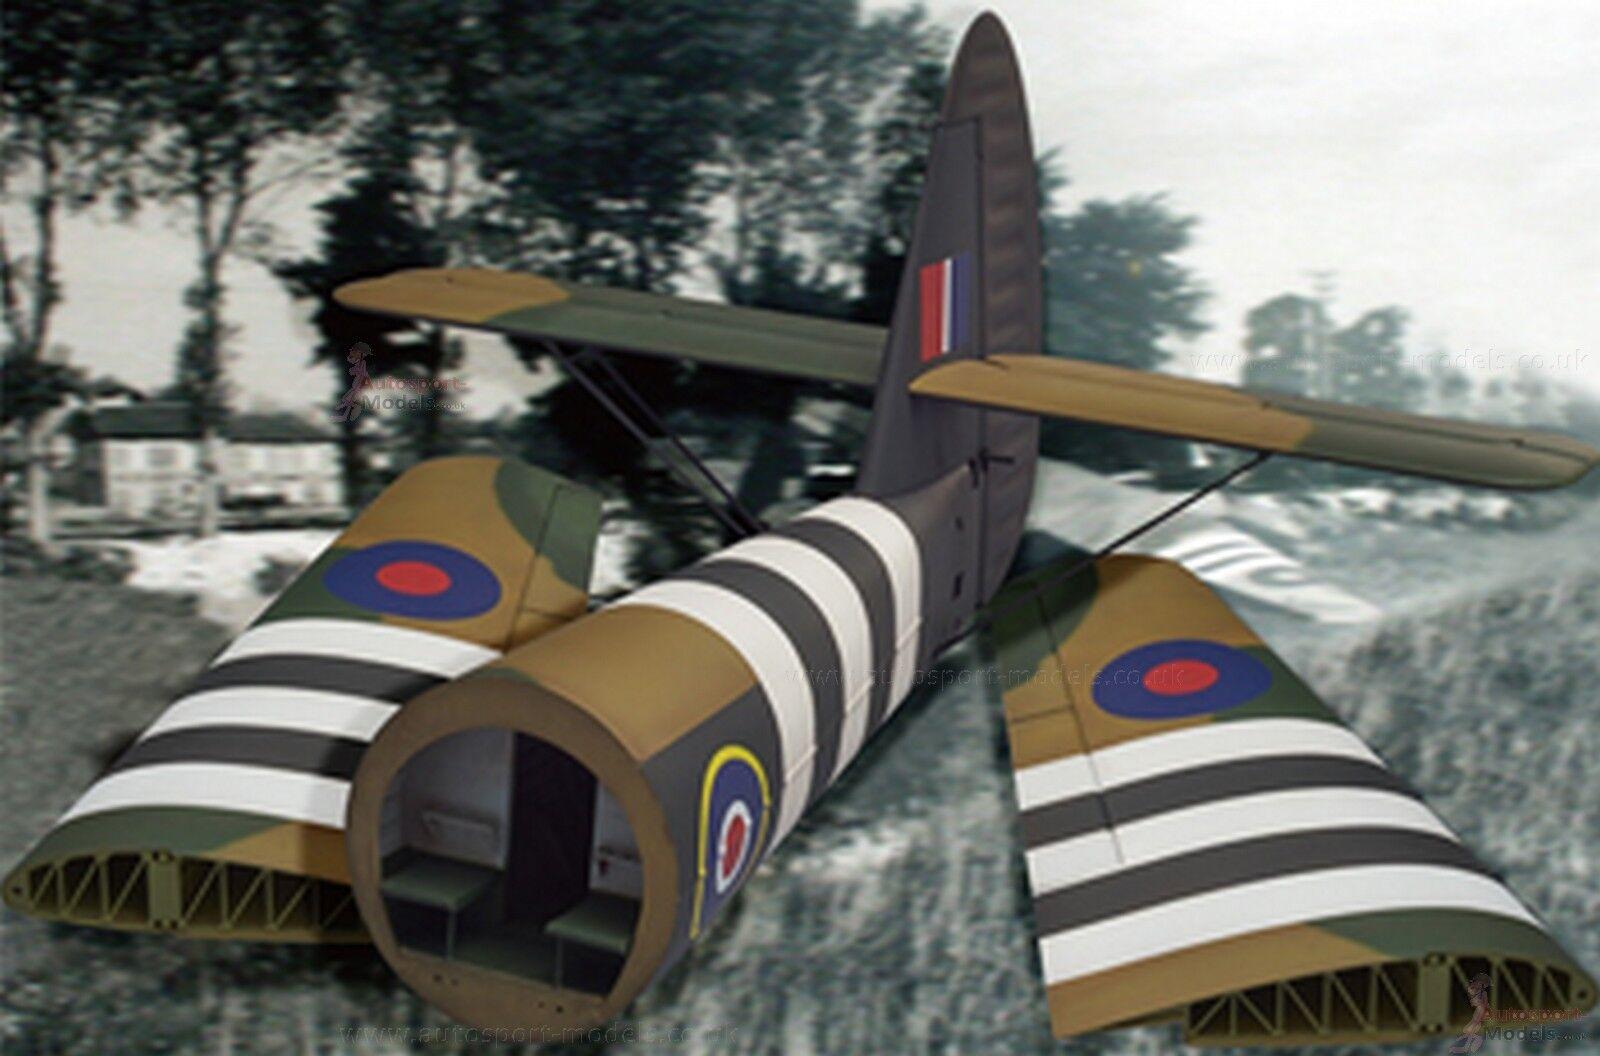 1 35 scale Horsa Glider Wings & Rear Fuselage (Tail)  model kit by Bronco Models